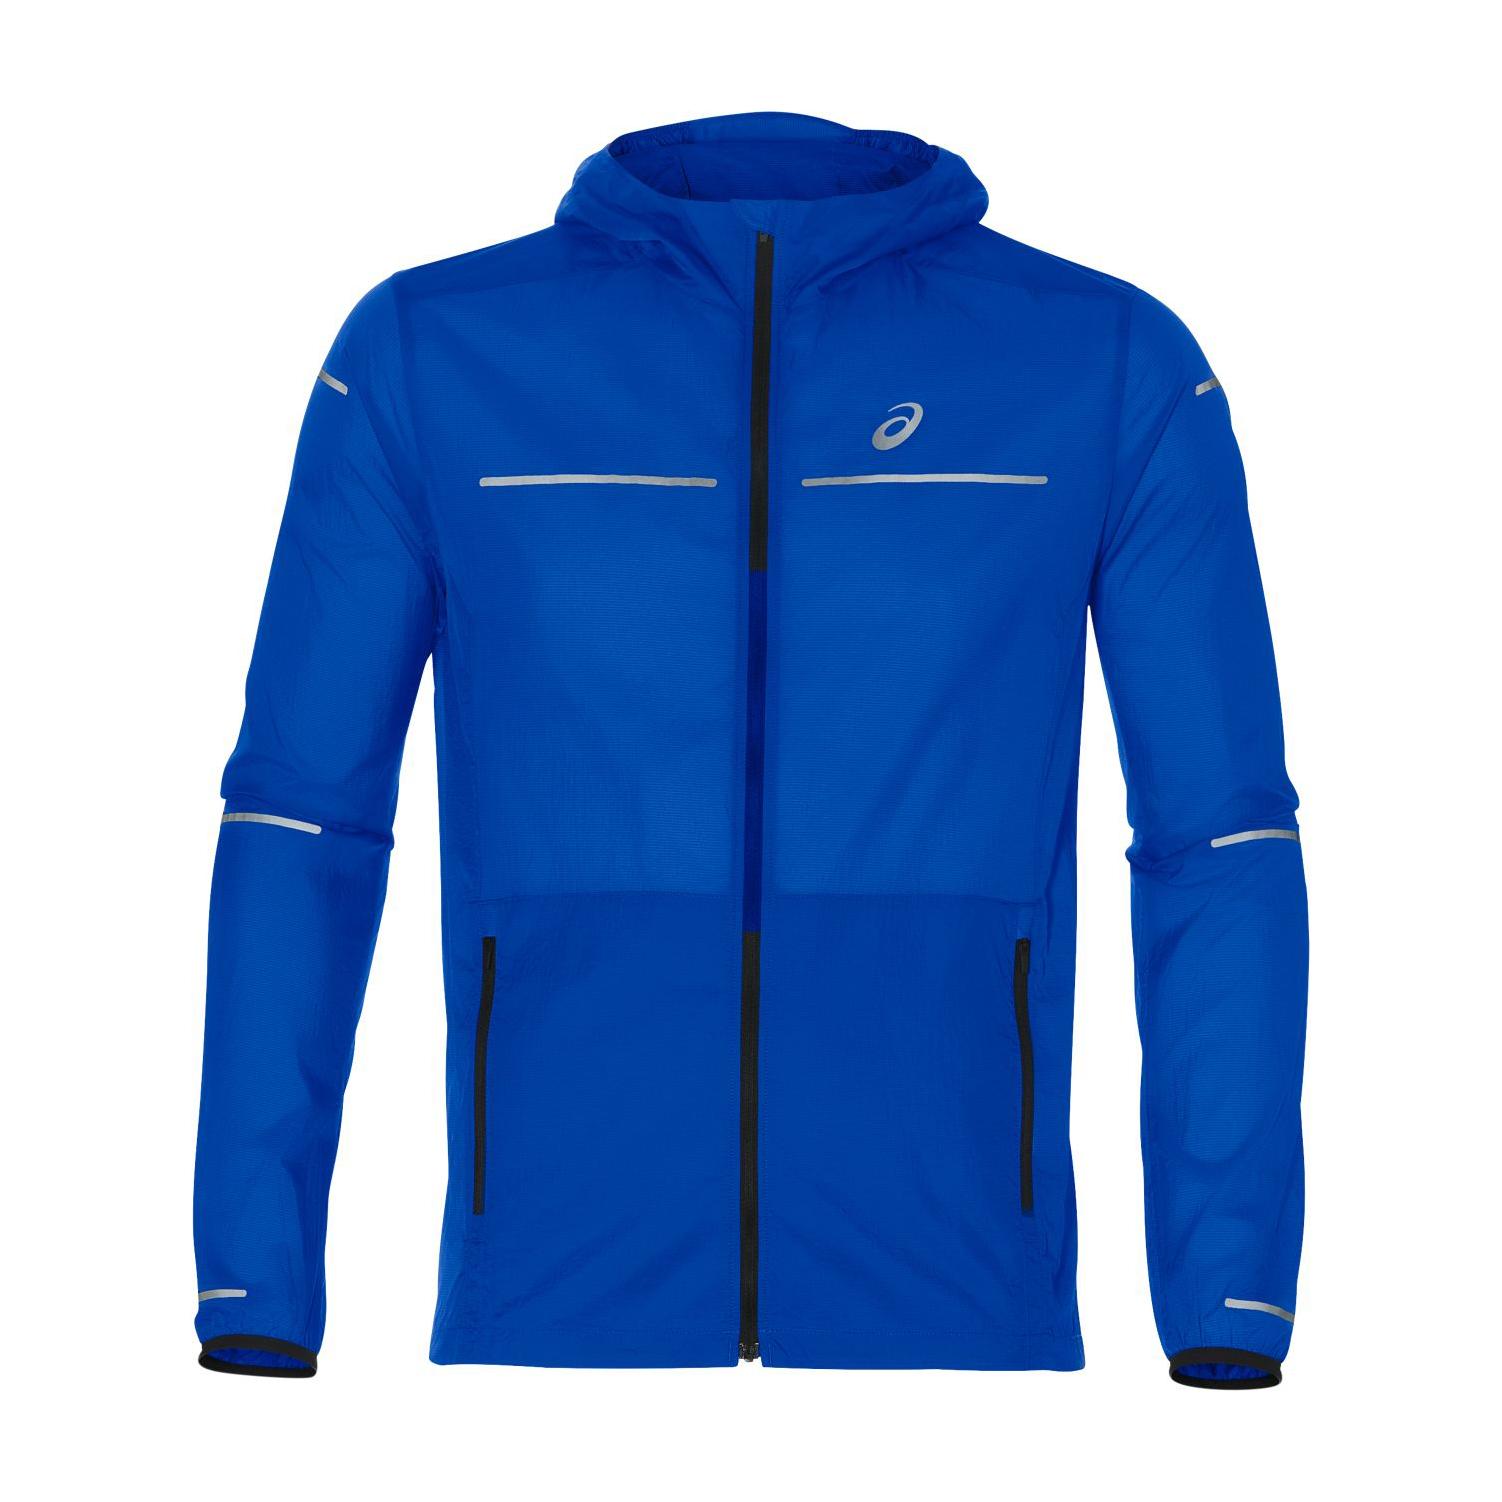 70b98379a Asics Men's Lite-Show Running Jacket - Illusion Blue | Men's Coats ...